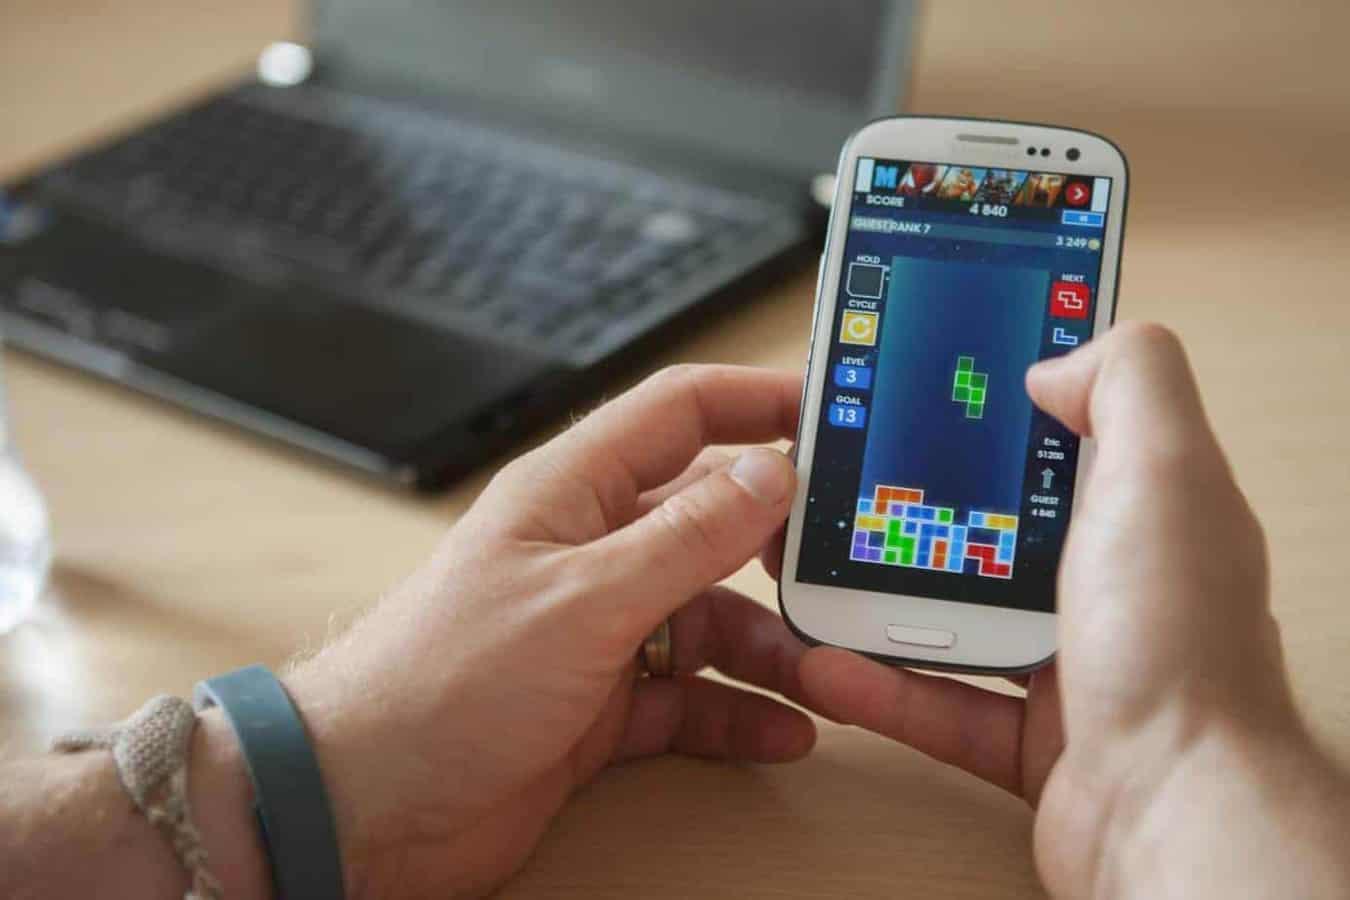 Tetris can block cravings